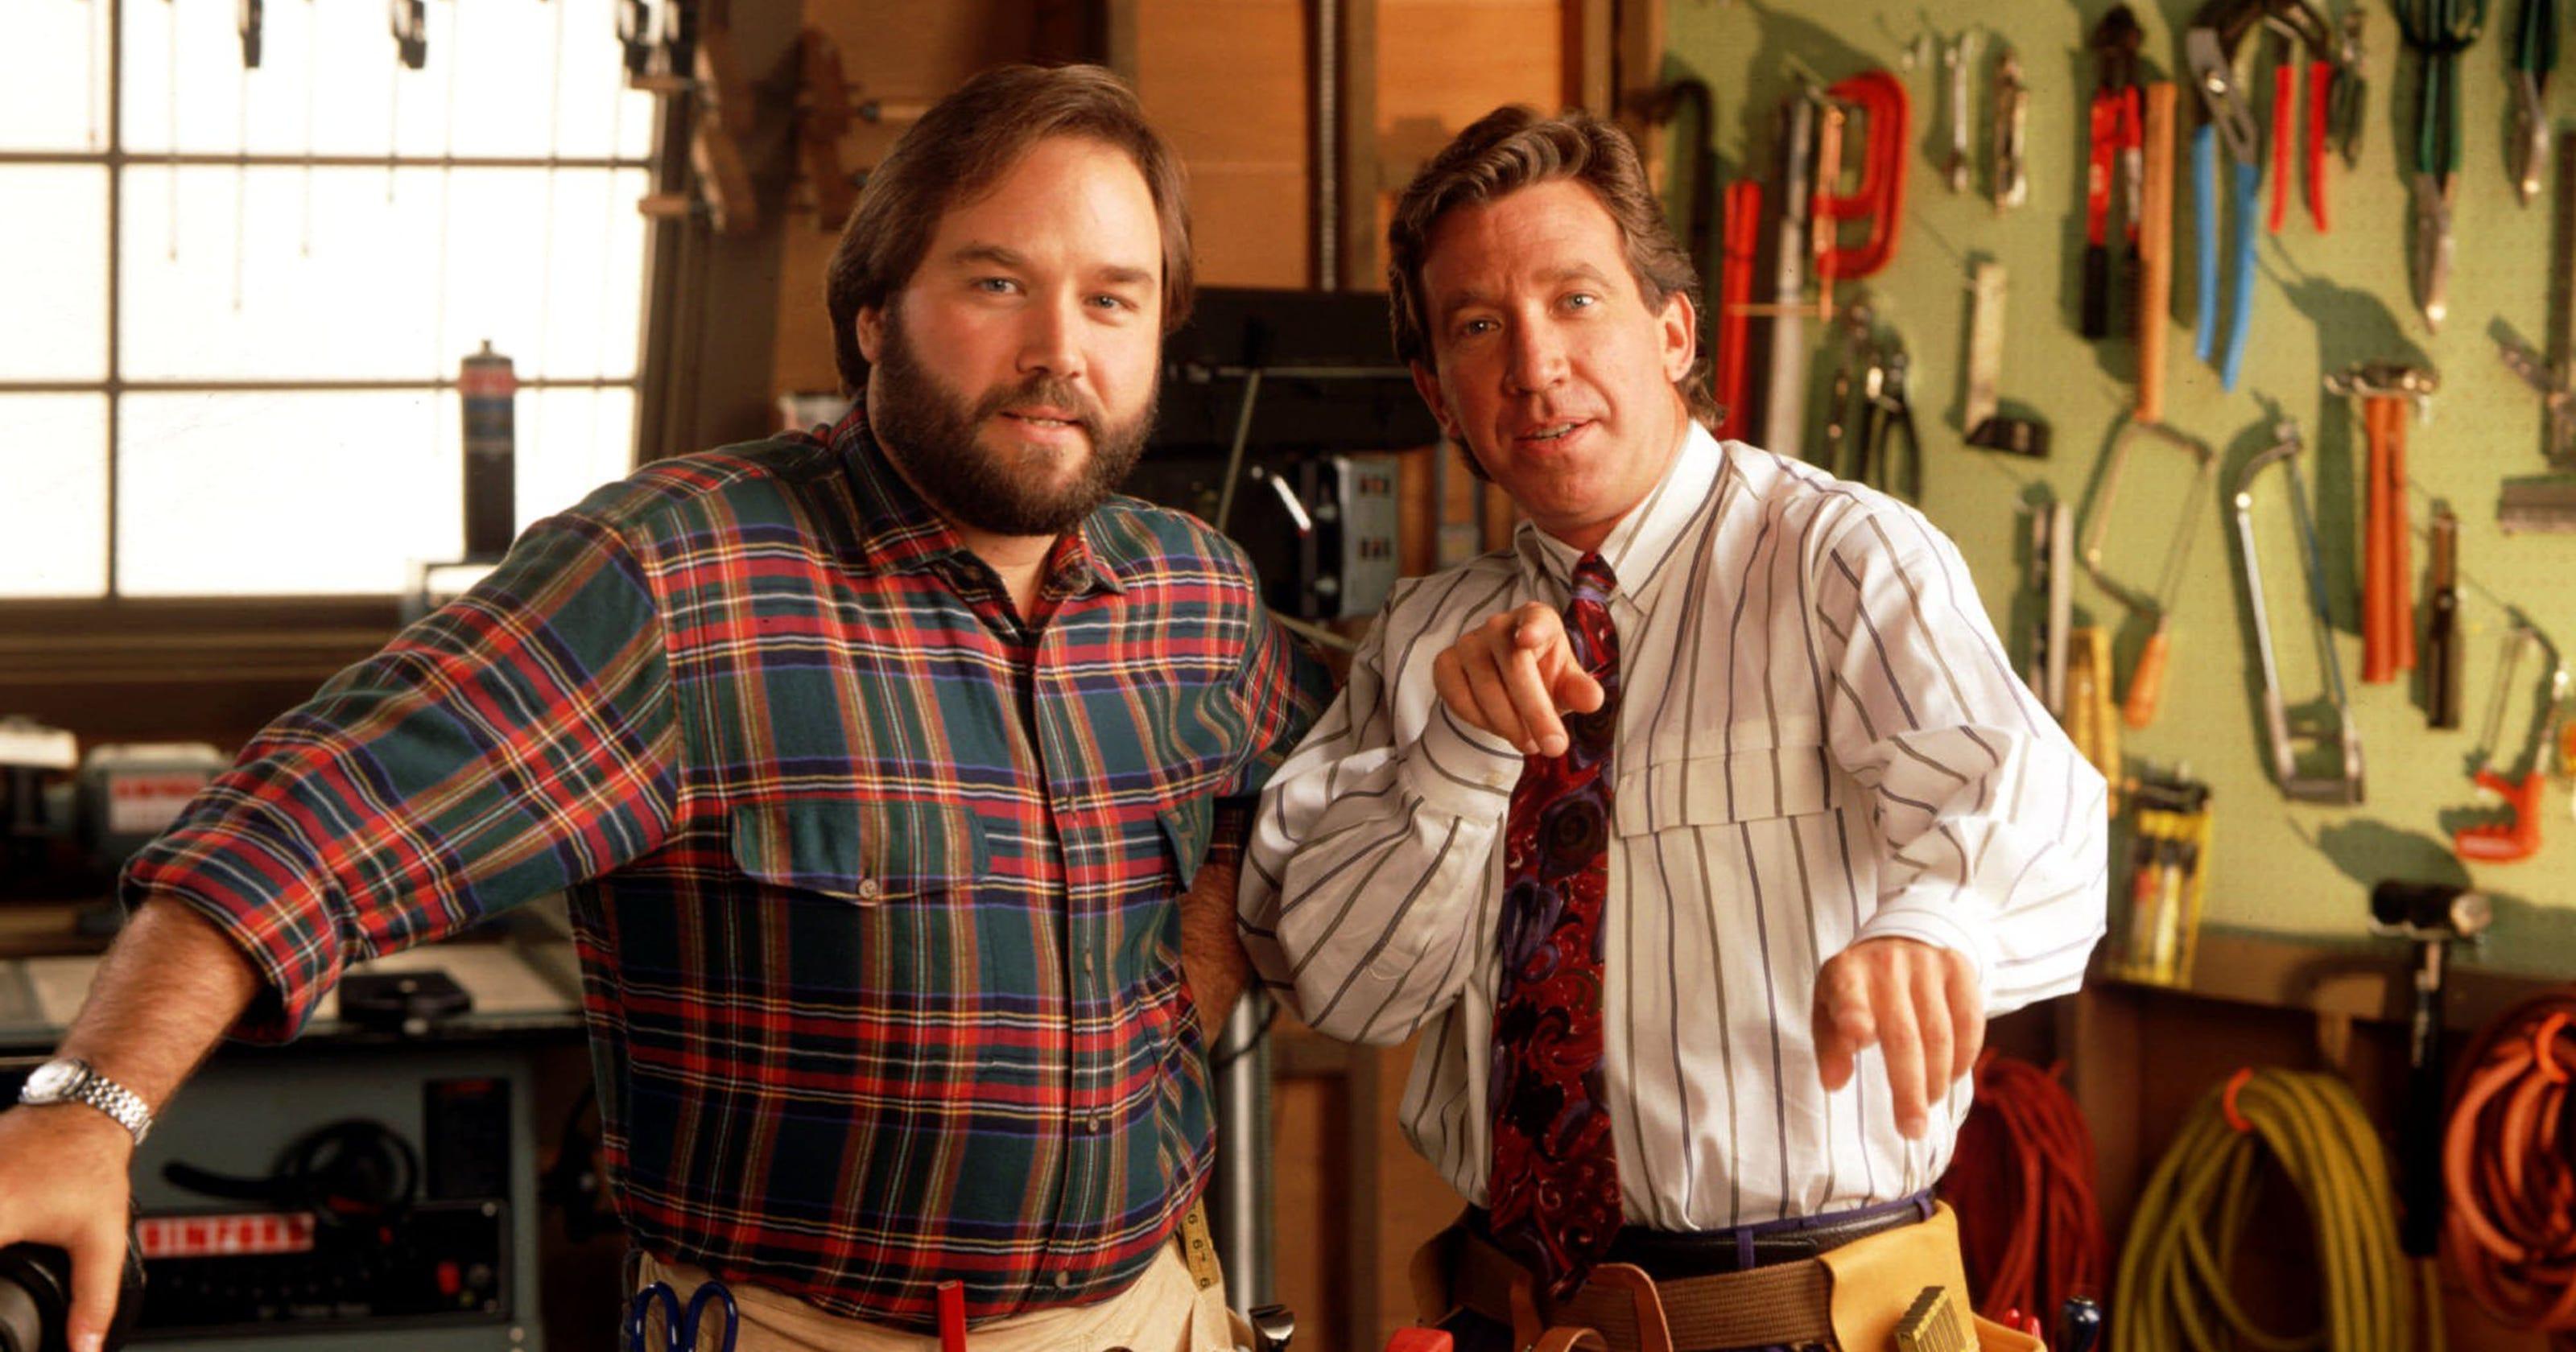 Home Improvement' is Michigan's favorite '90s sitcom, study says